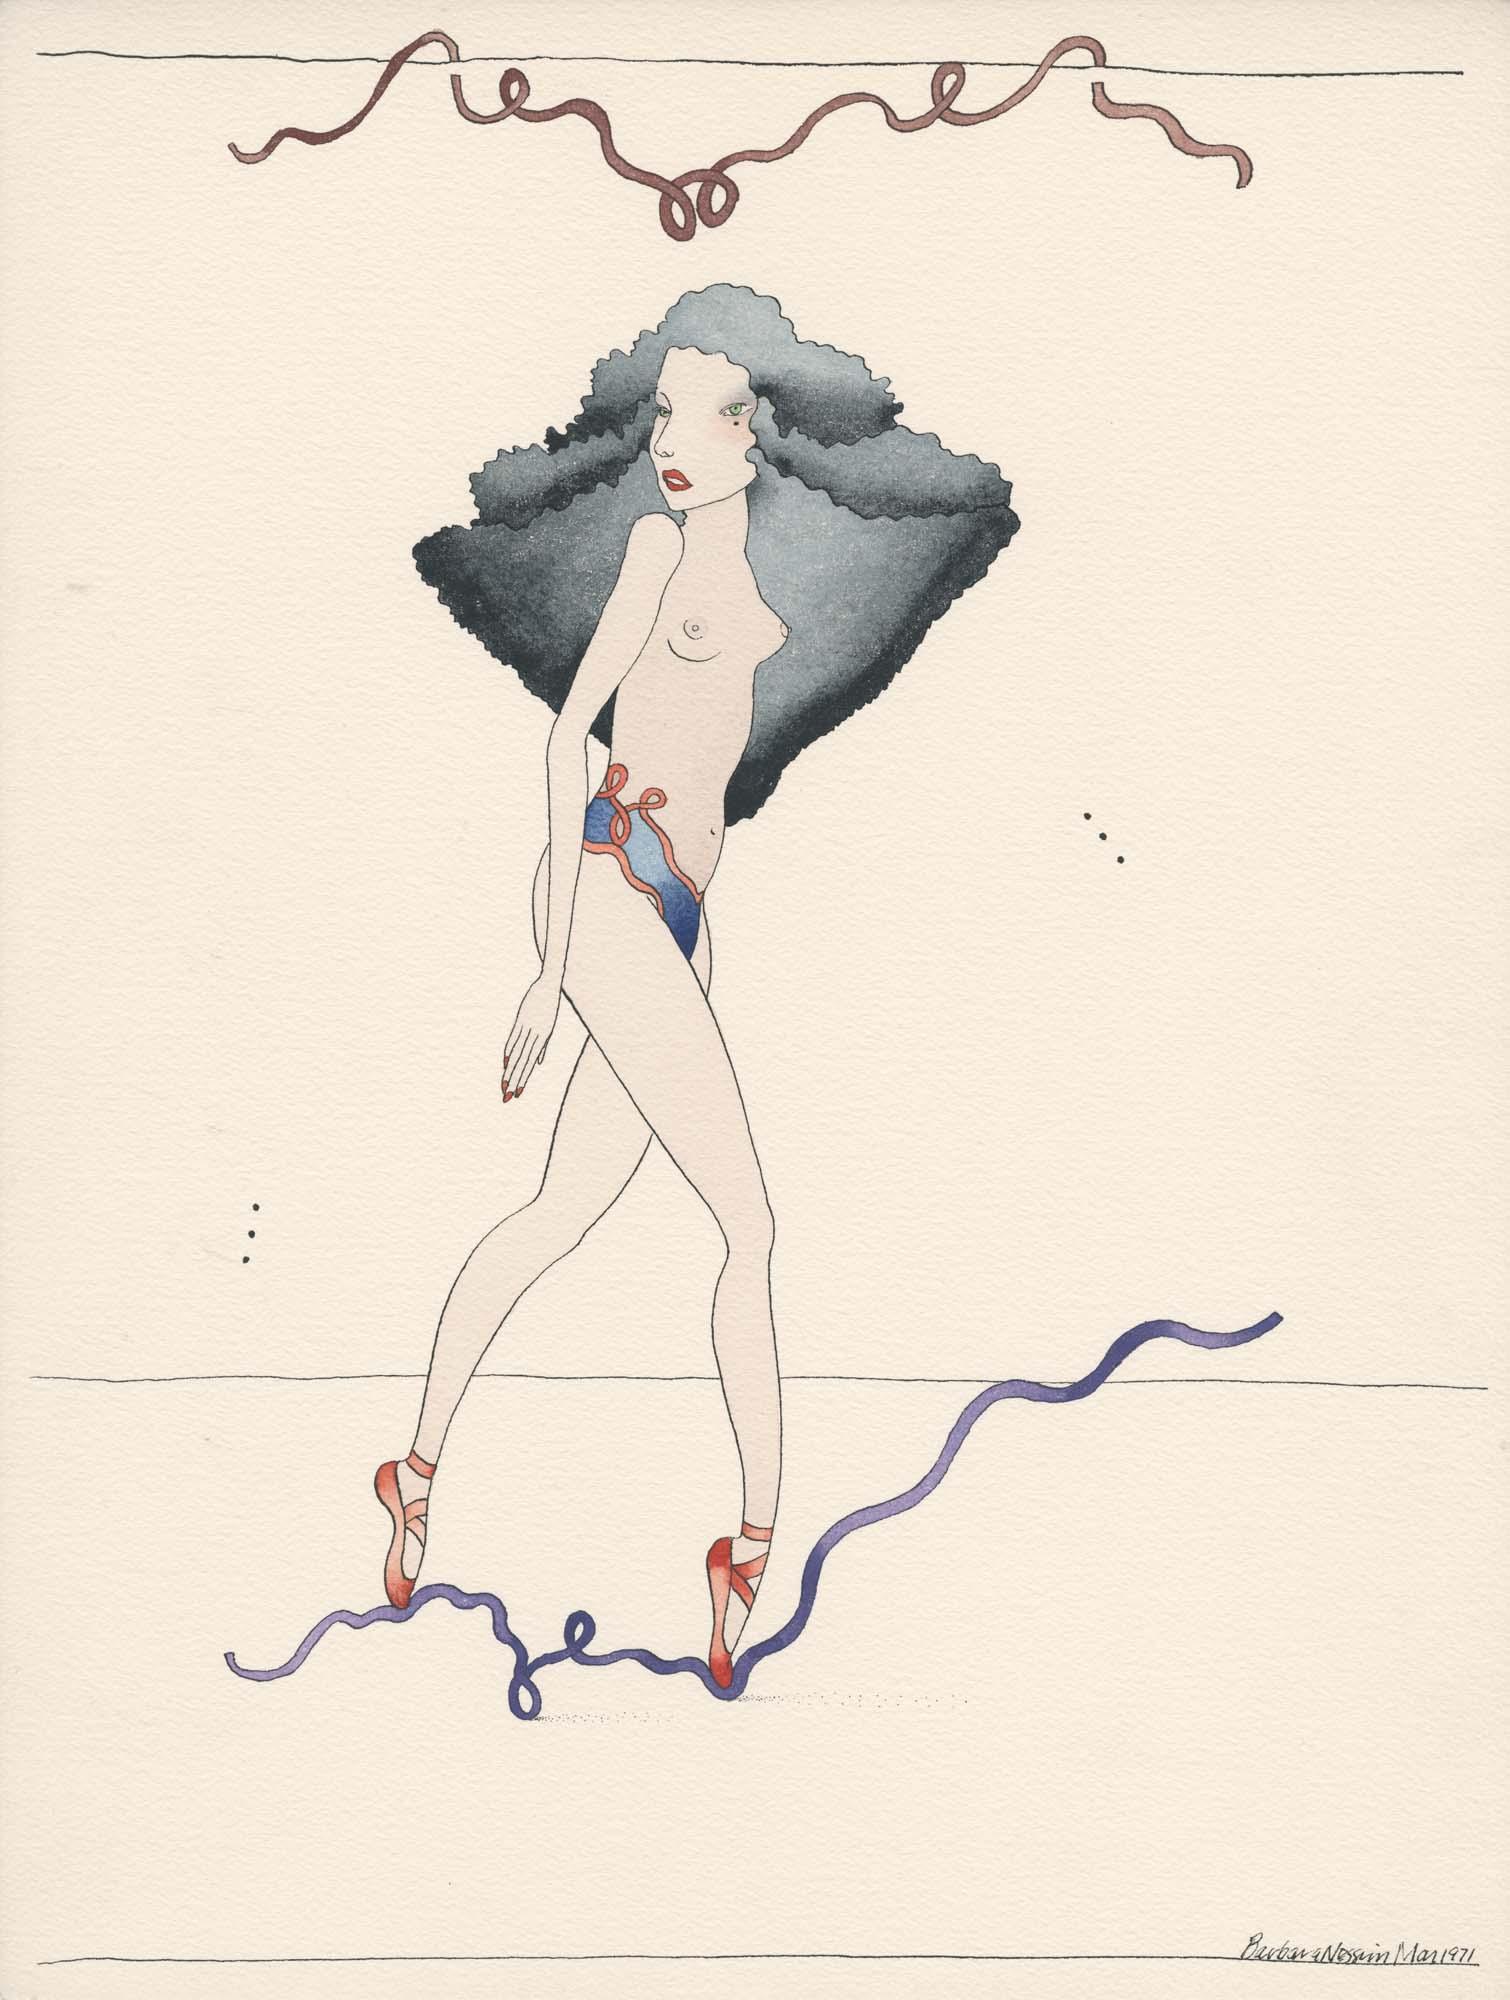 <i>Dancing on a String</i>, 1971